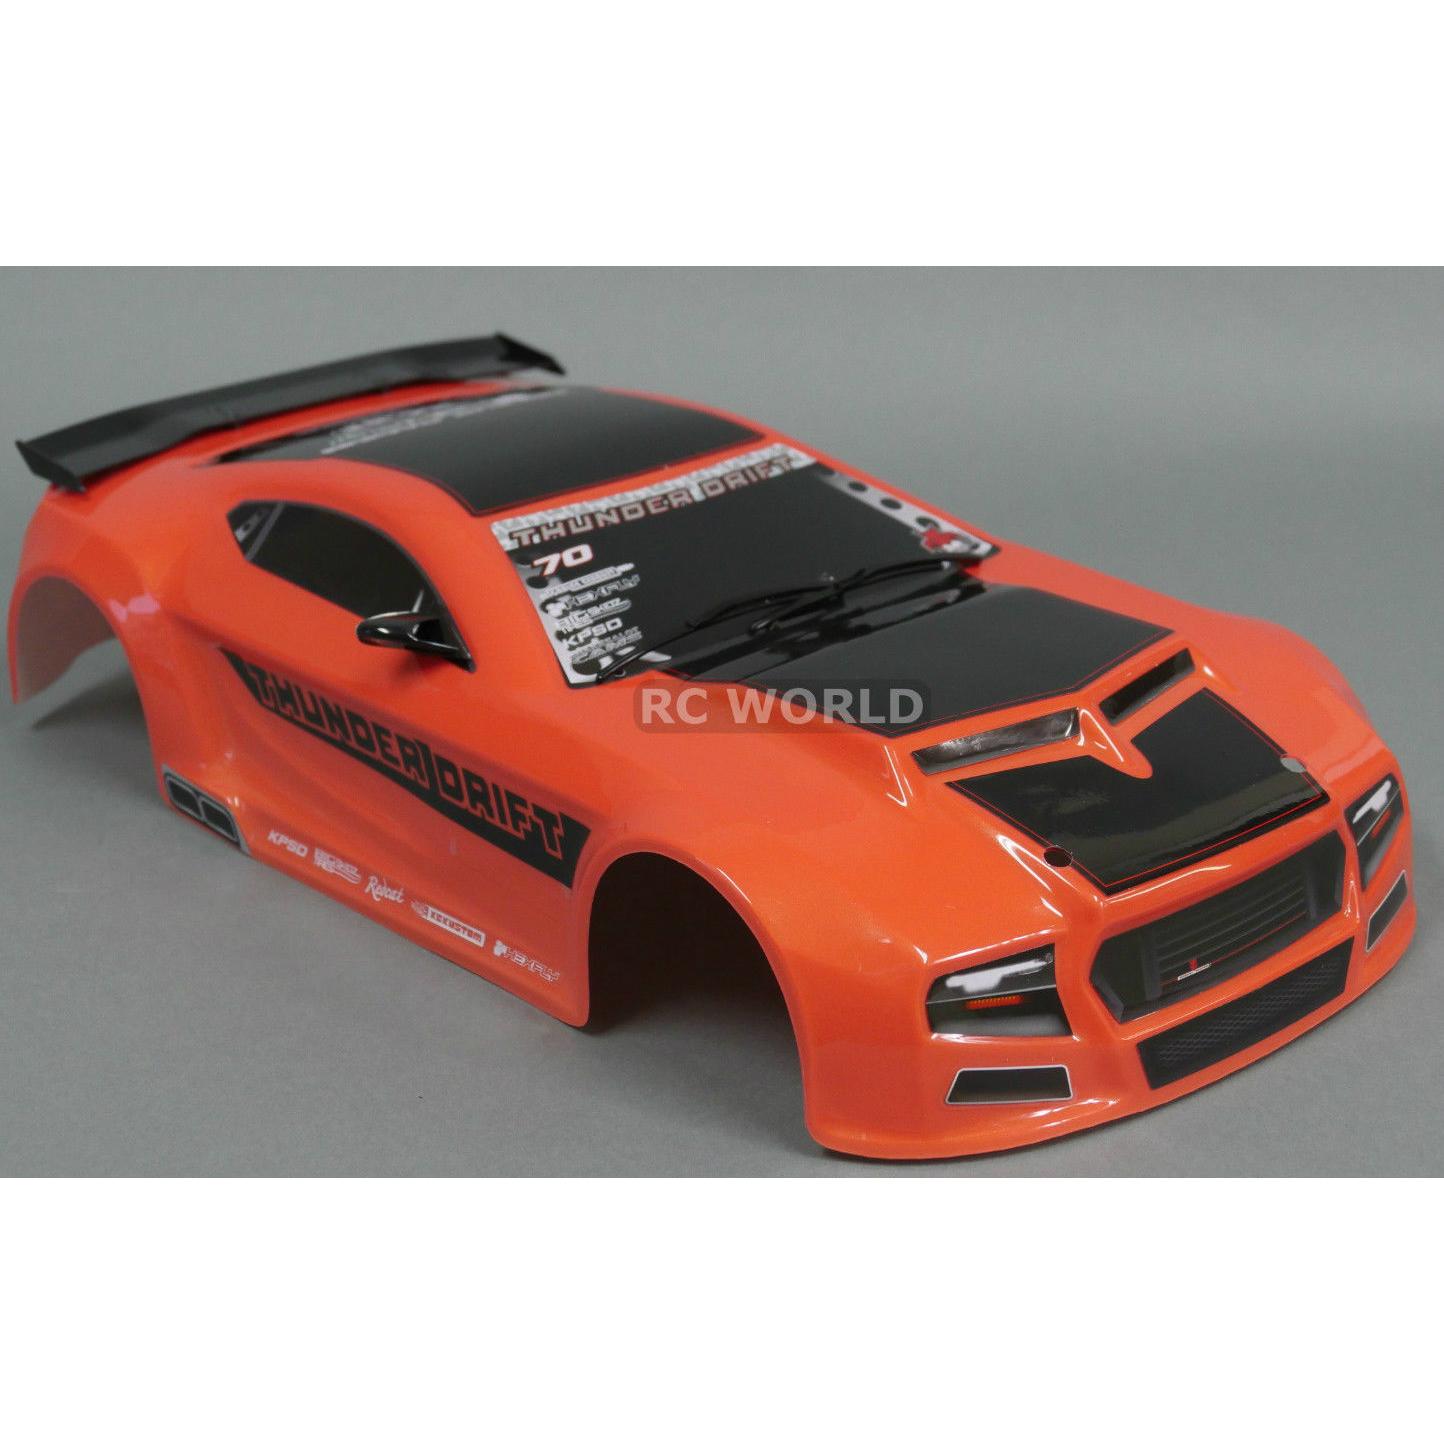 1/10 RC Car Thunder Drift Body Shell For Sale In Jamaica